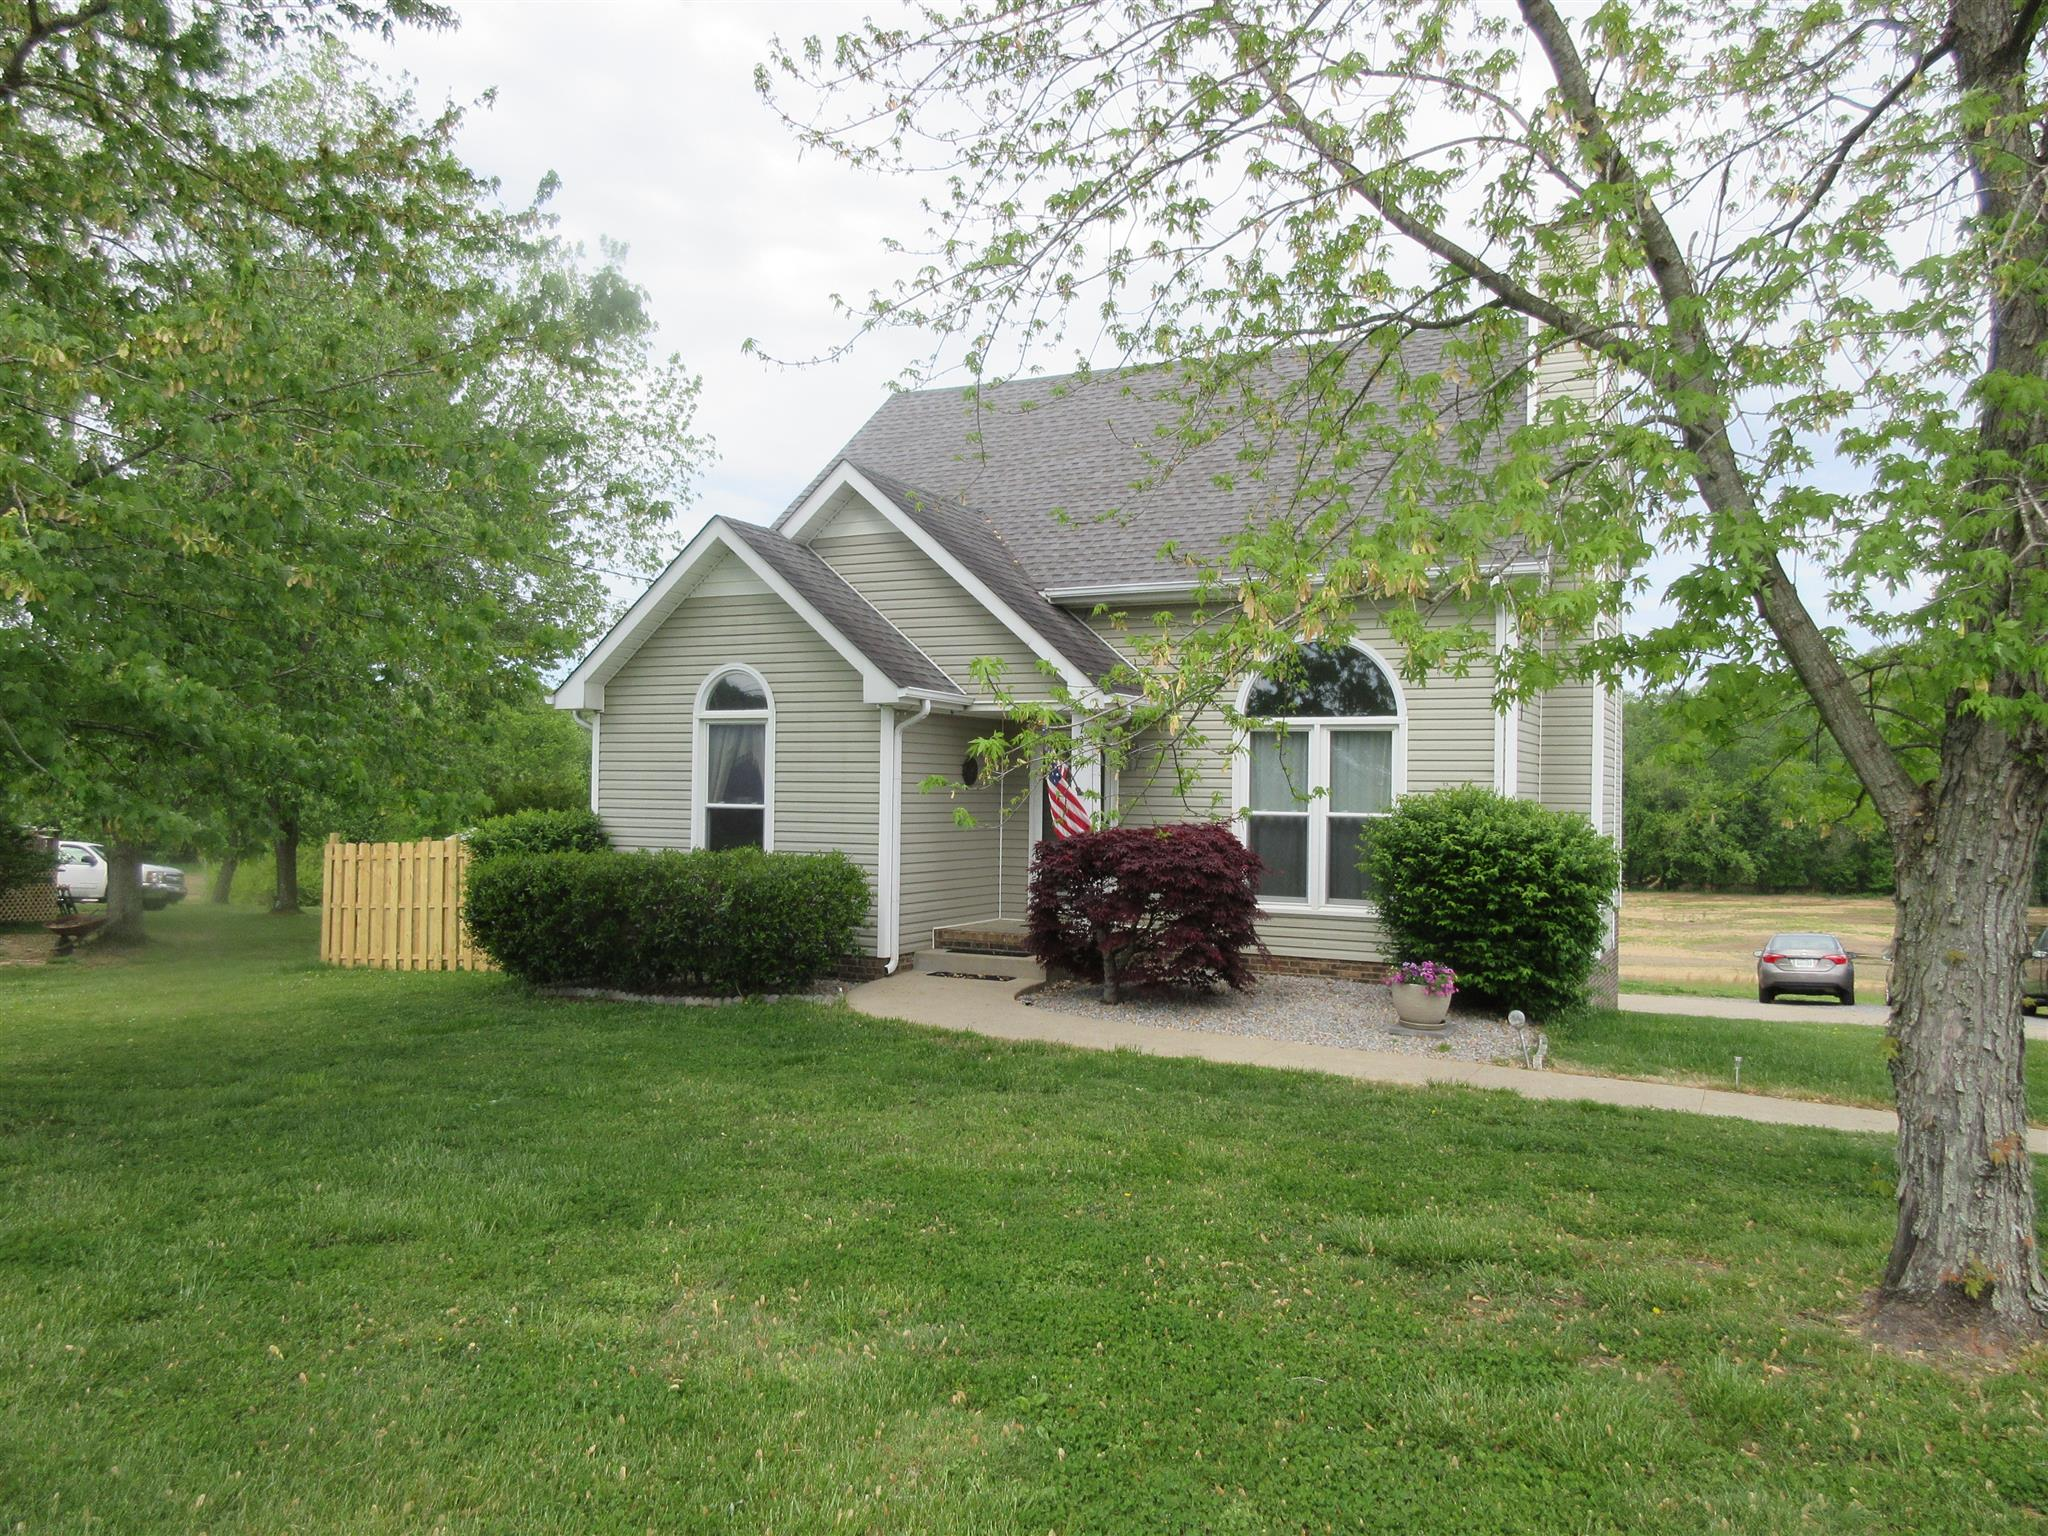 728 W Creek Dr, Clarksville, TN 37040 - Clarksville, TN real estate listing